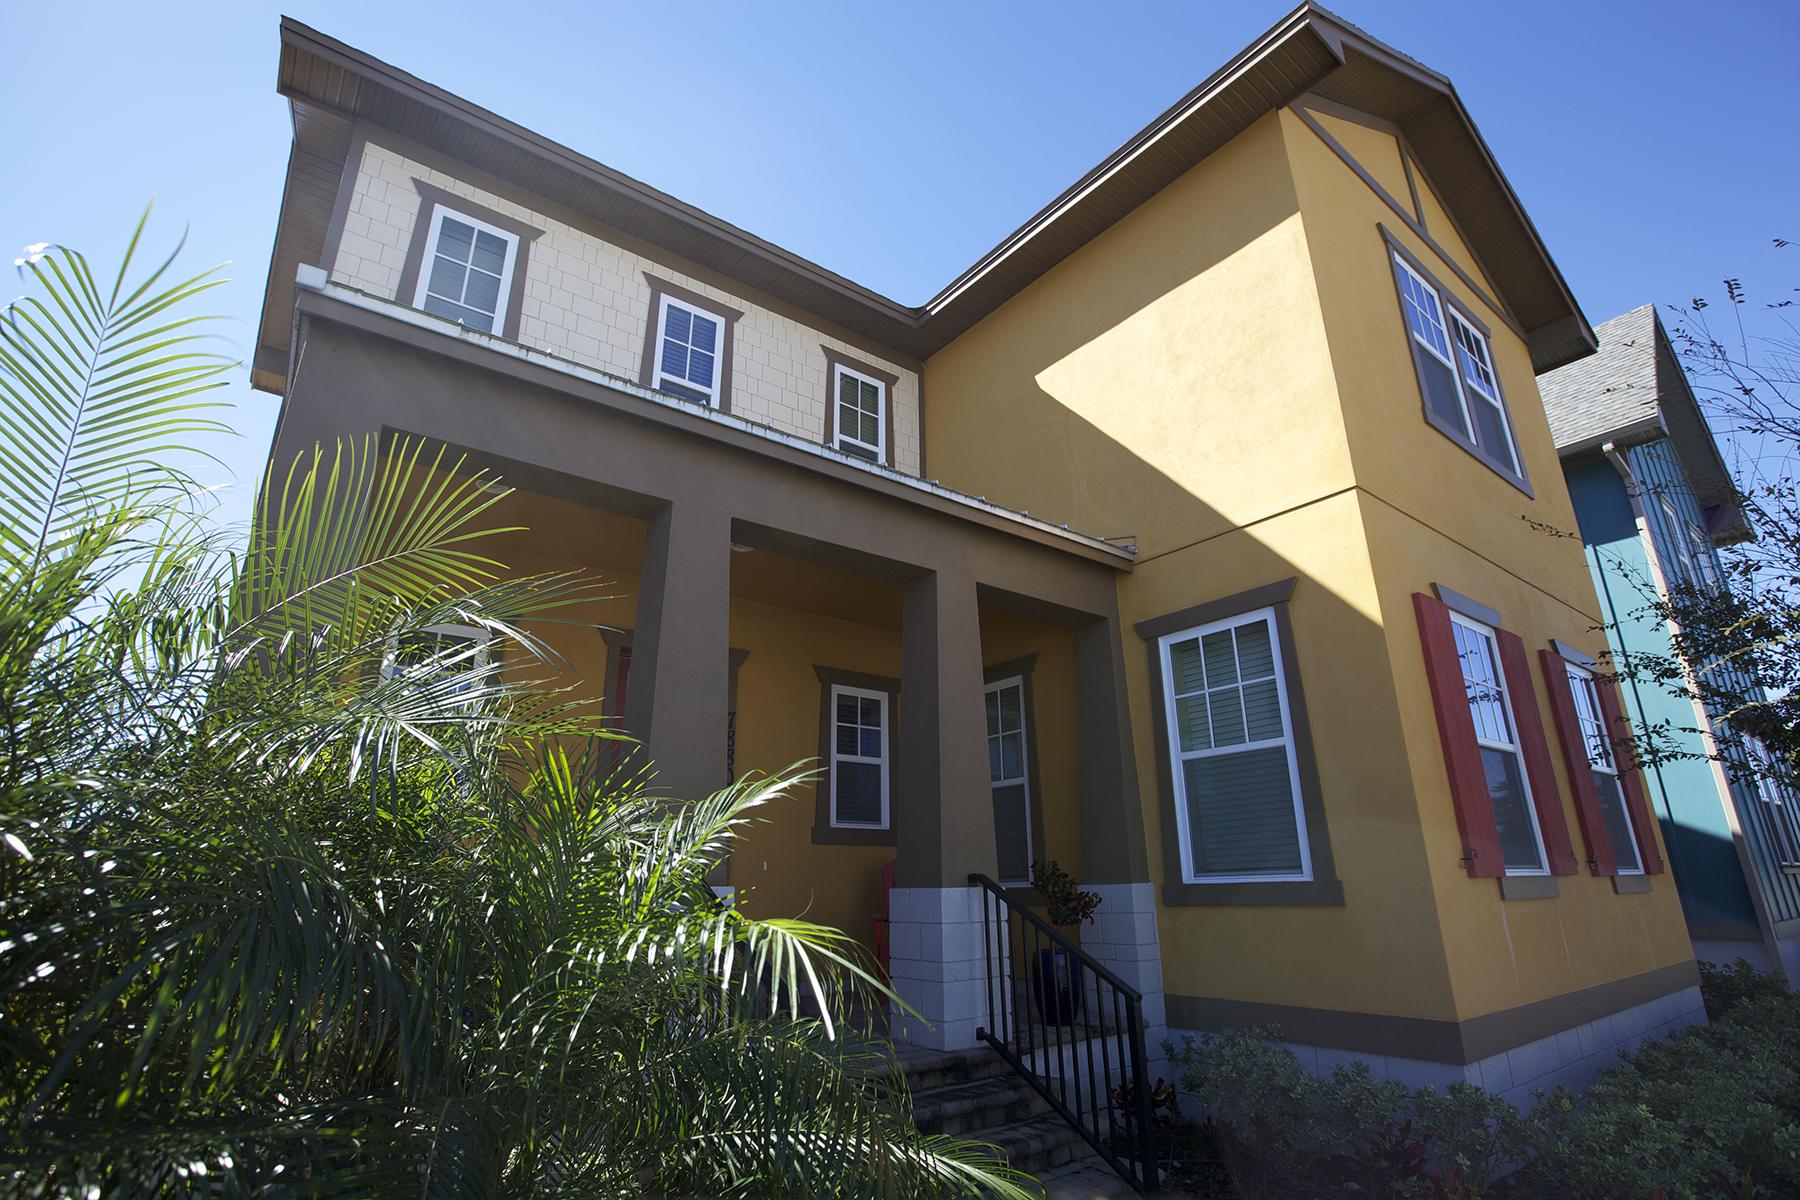 獨棟家庭住宅 為 出售 在 LAKE NONA 7880 Laureate Blvd Orlando, 佛羅里達州, 32827 美國